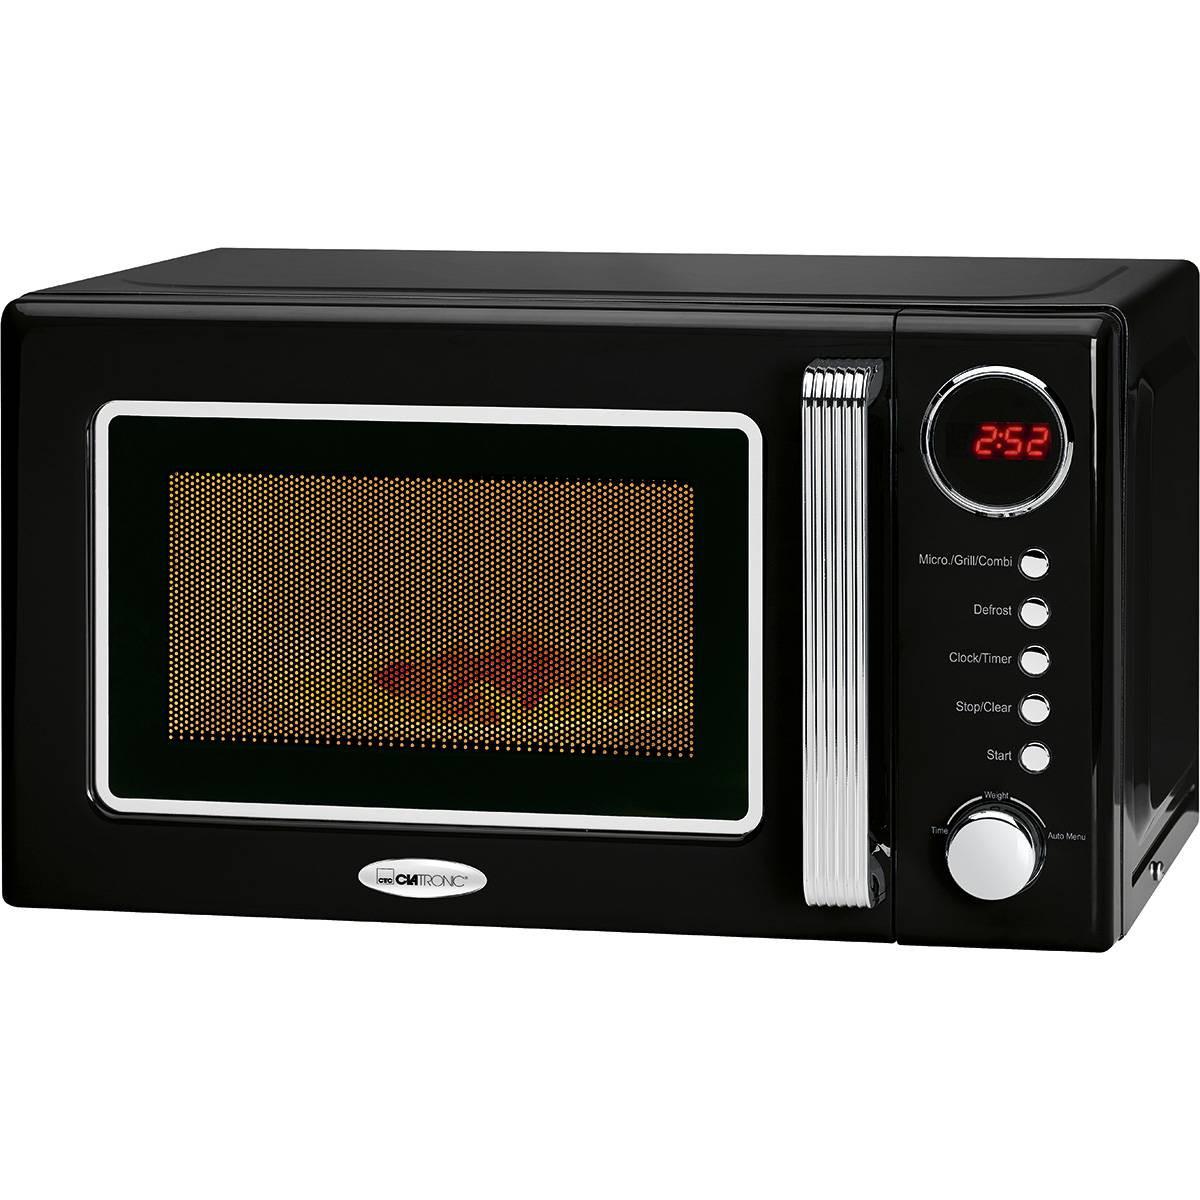 Clatronic MWG 790 - Microondas con grill retro 20 litros, 700/1000W, display digital, timer, color negro